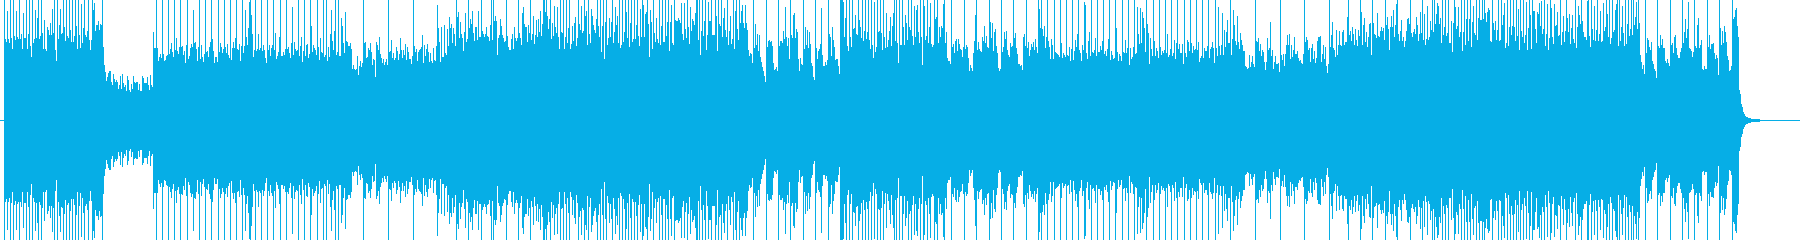 「HEAVY・POWERMETAL」の再生済みの波形